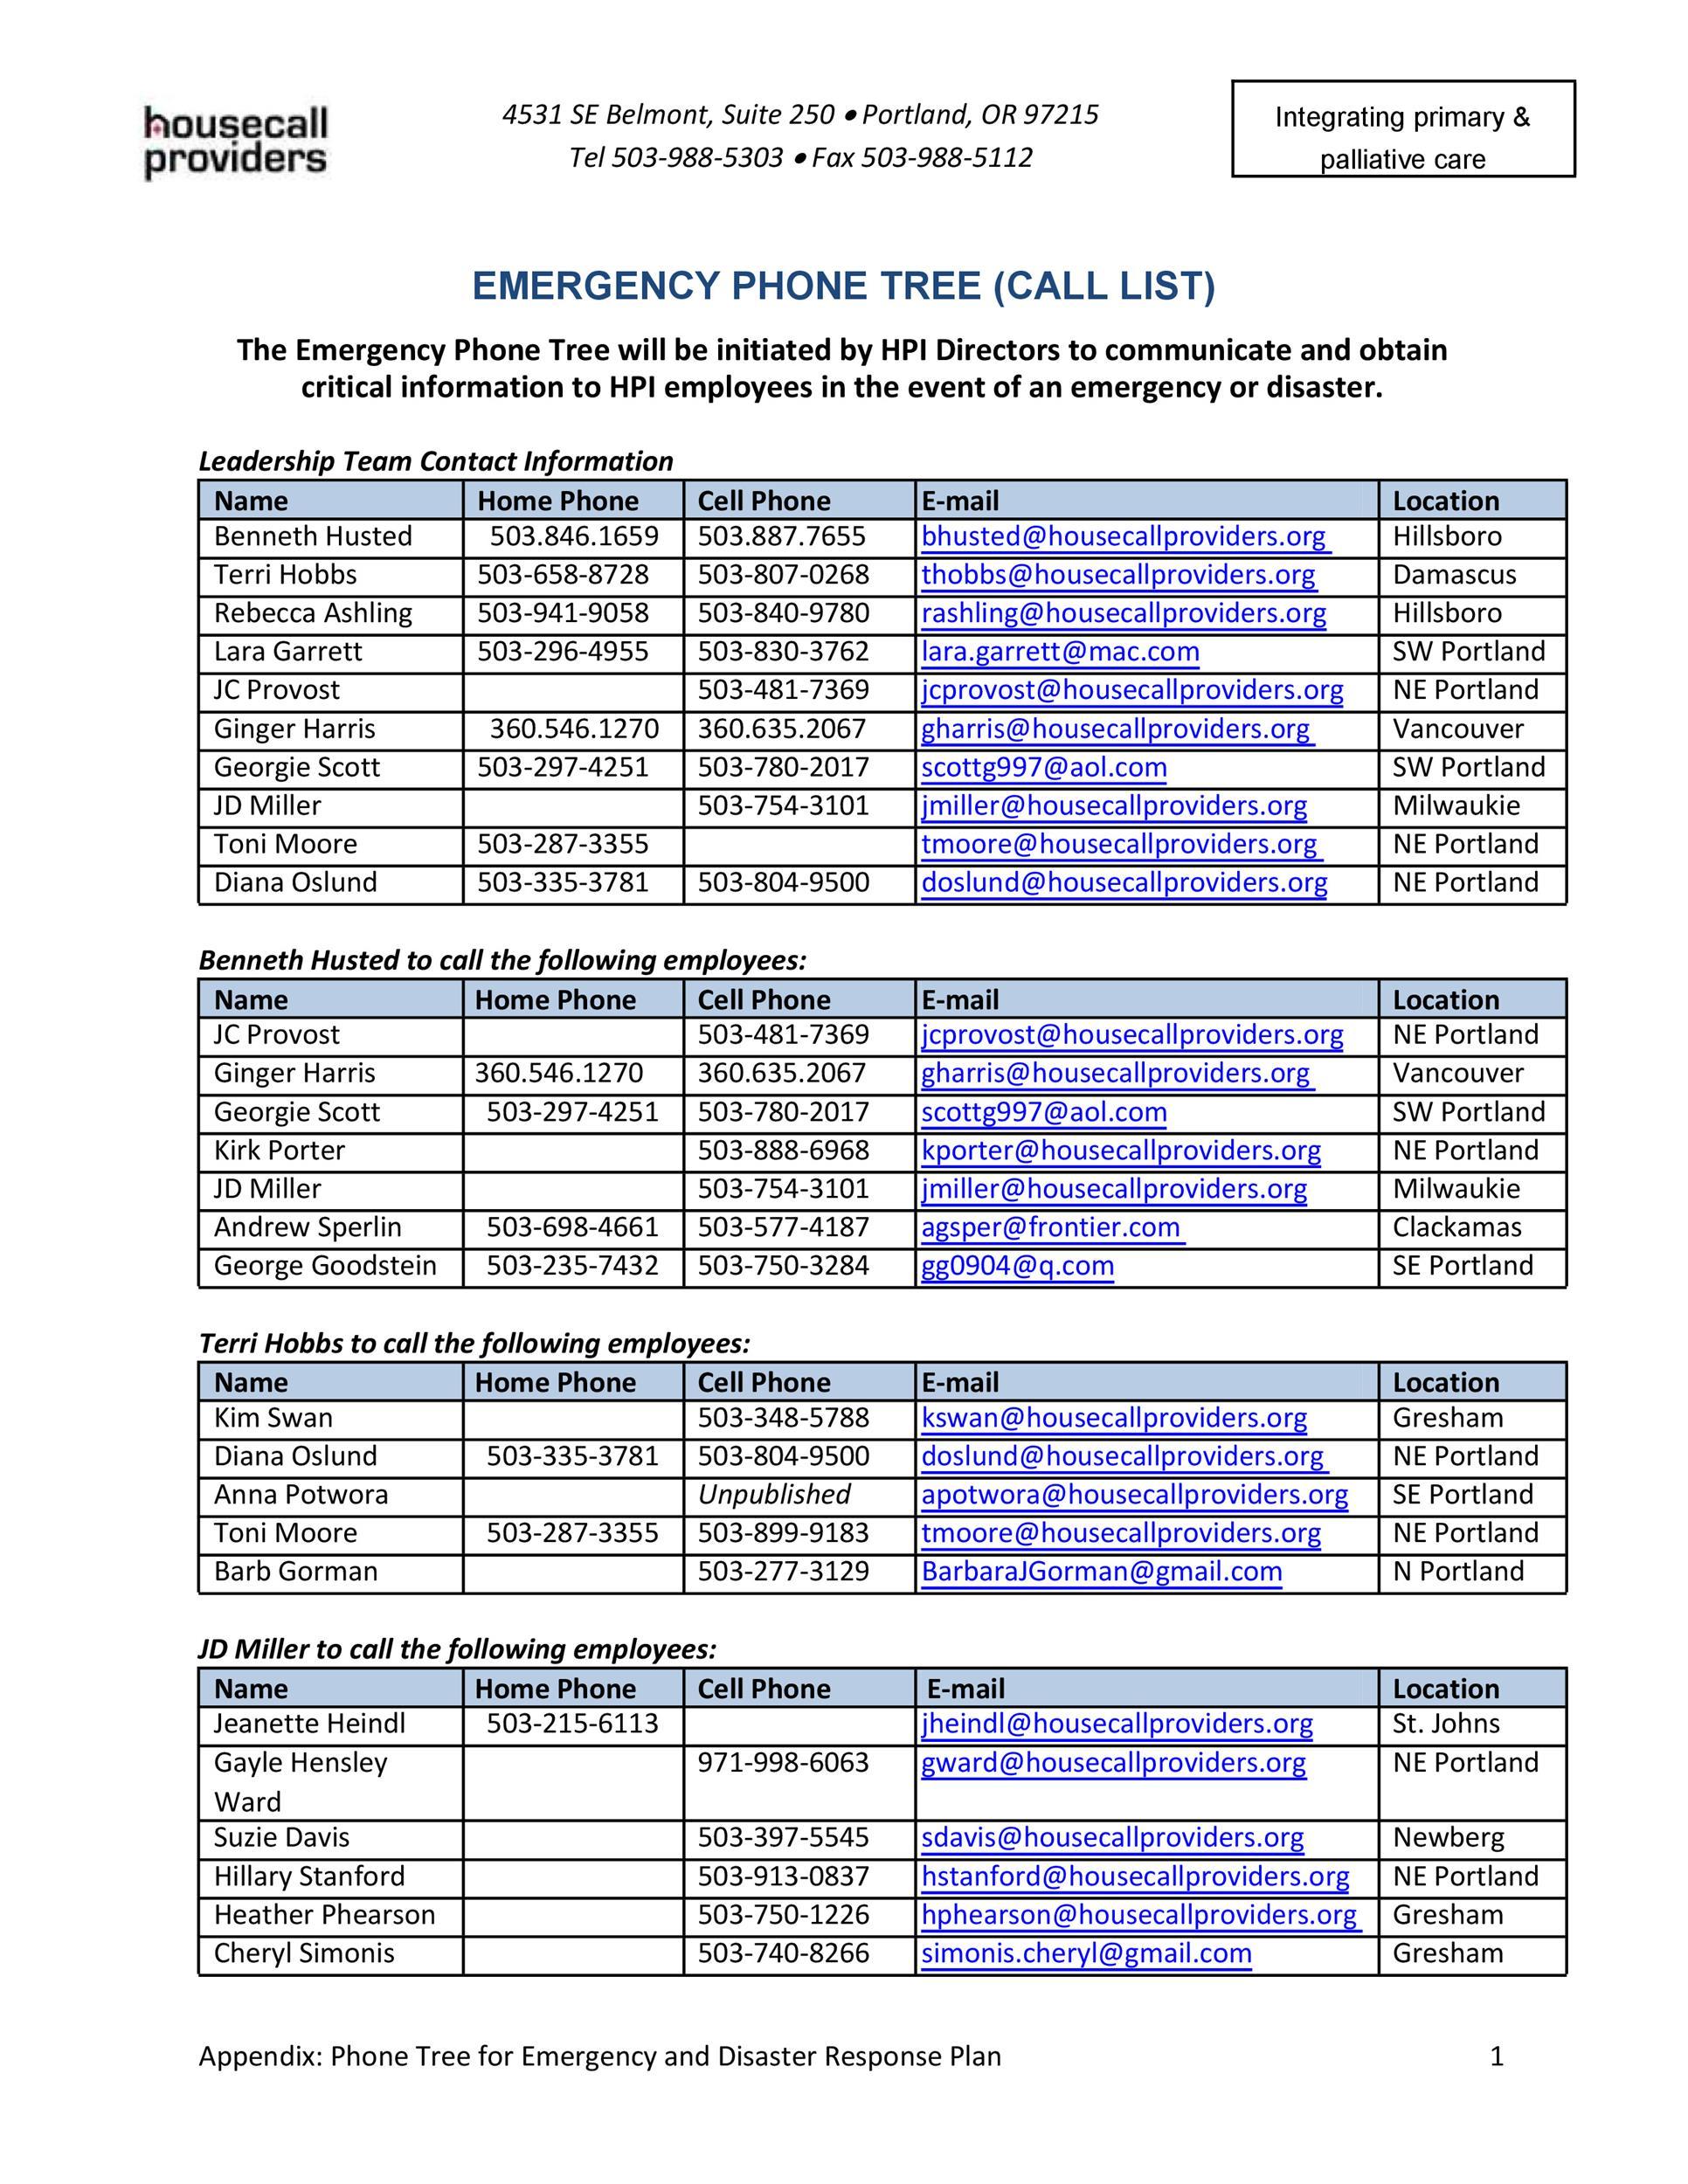 Free phone tree template 44